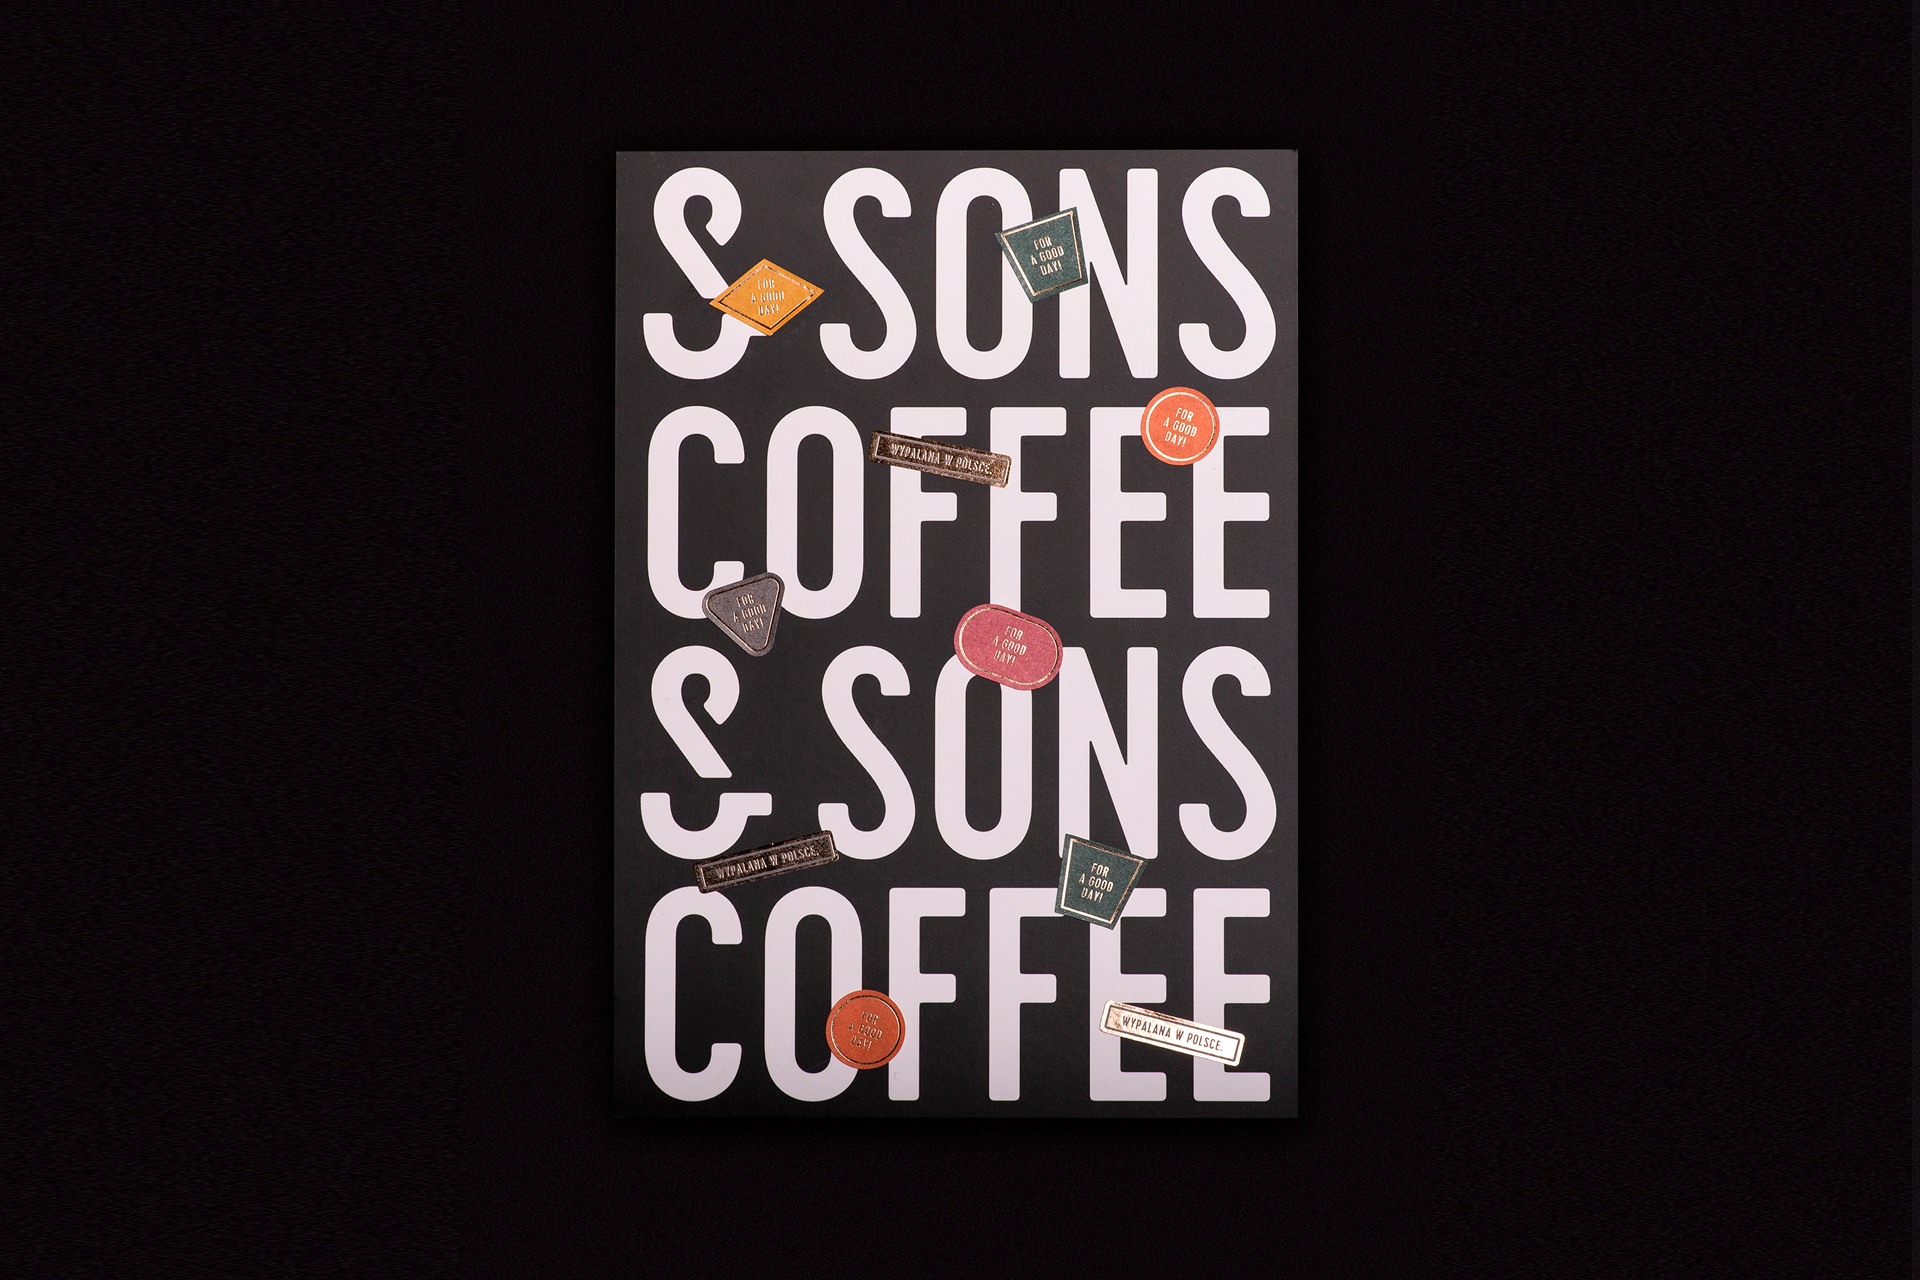 coffeeandsons_dmowskico_15.jpg